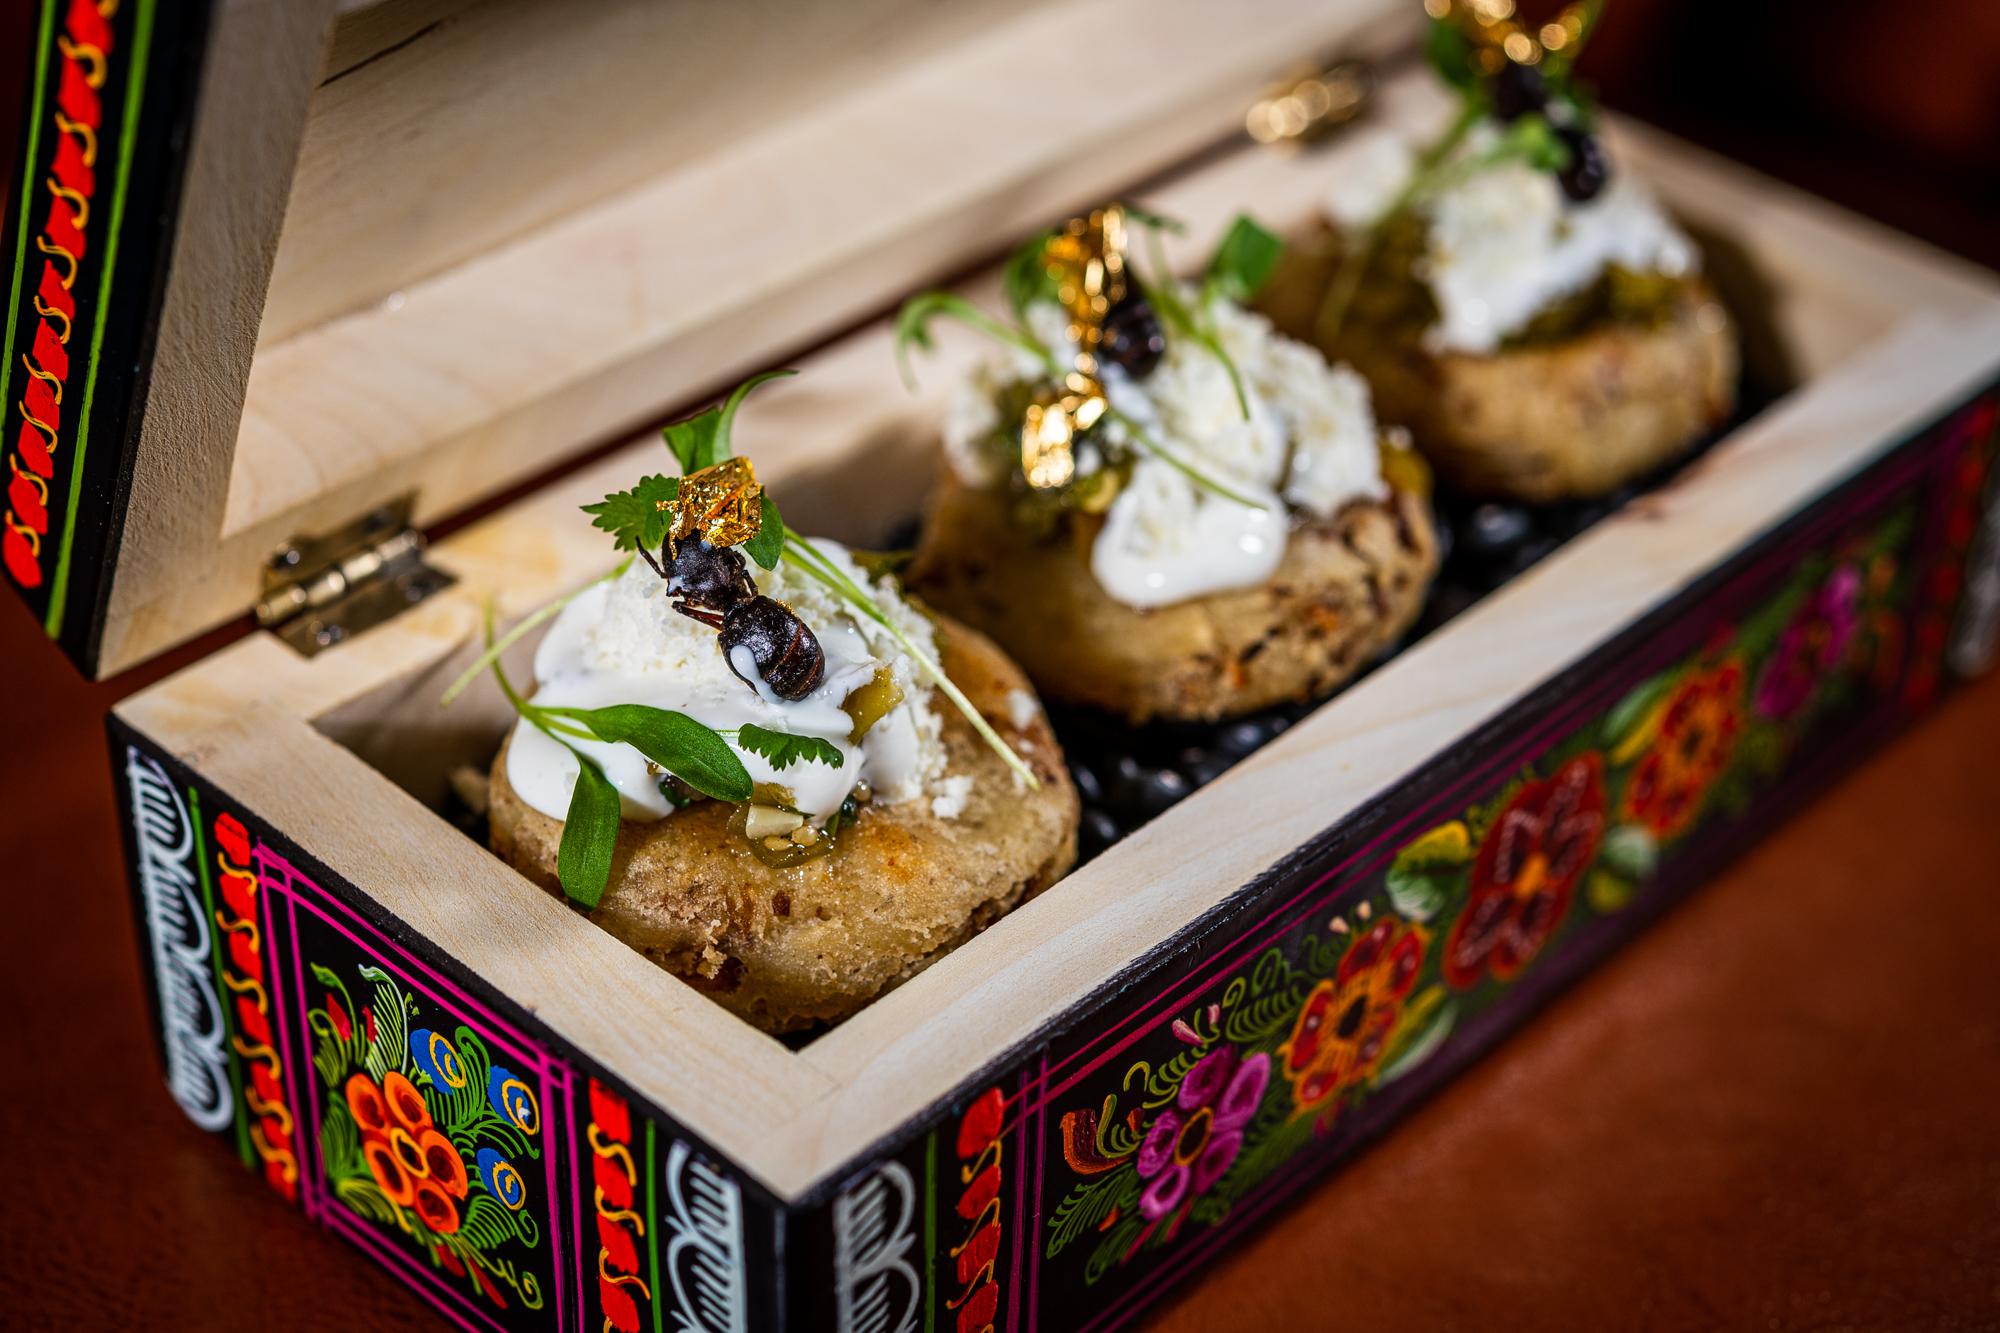 The namesake flying ants at Chicatana decorate bunuelos for dessert